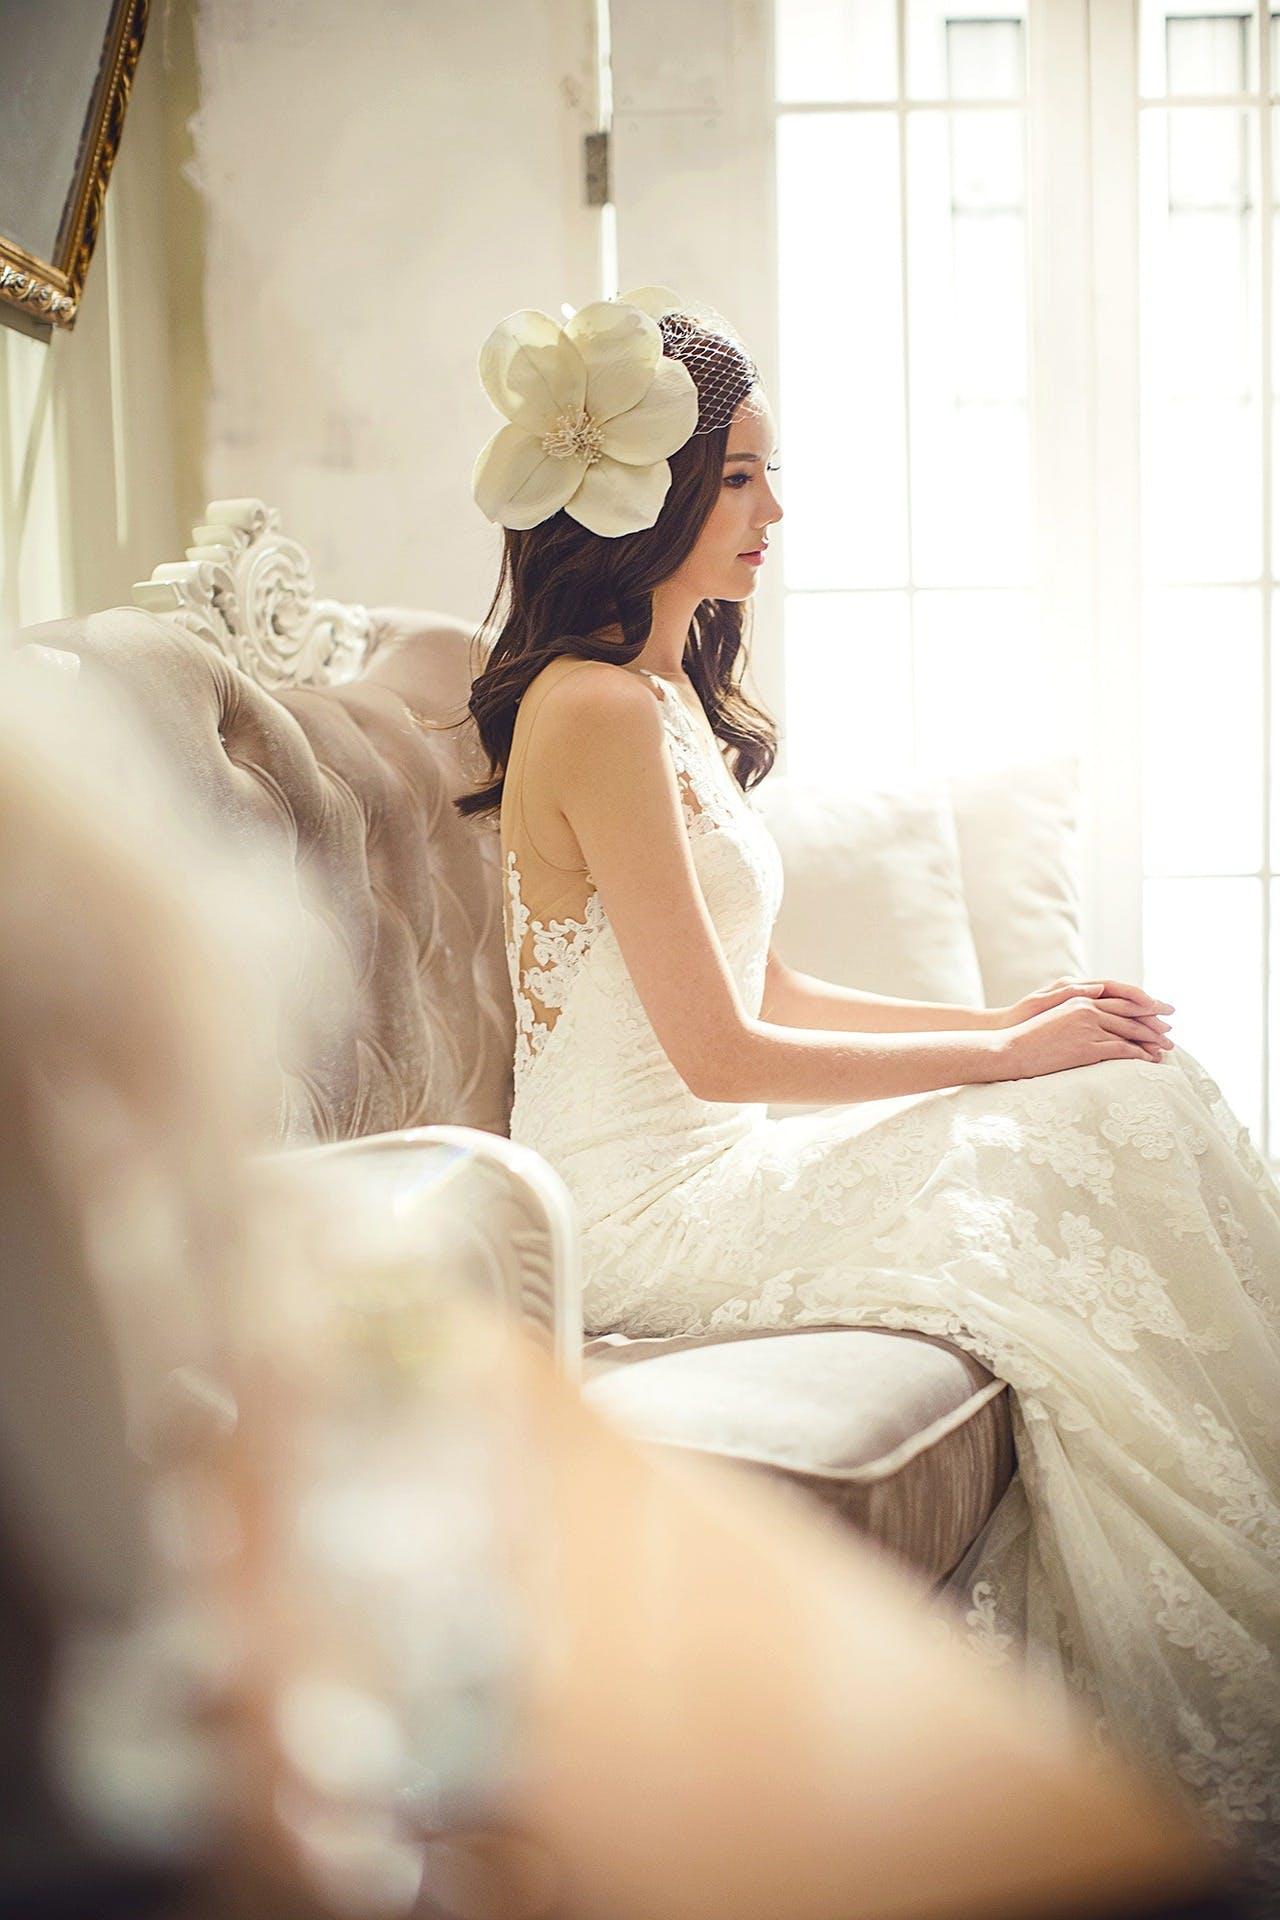 photographe mariage, shooting photo mariage, photos mariage